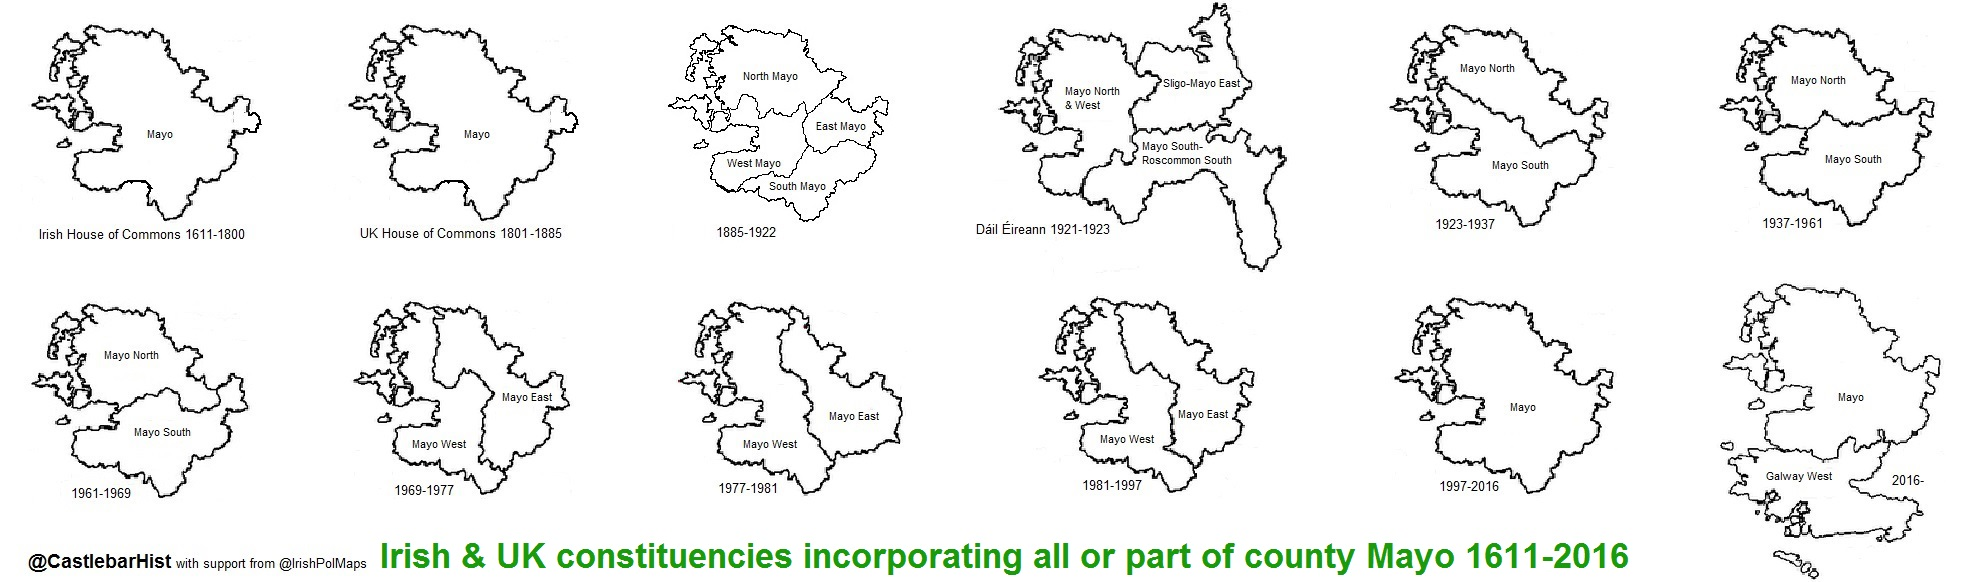 Mayo_Constituency_Maps.jpg